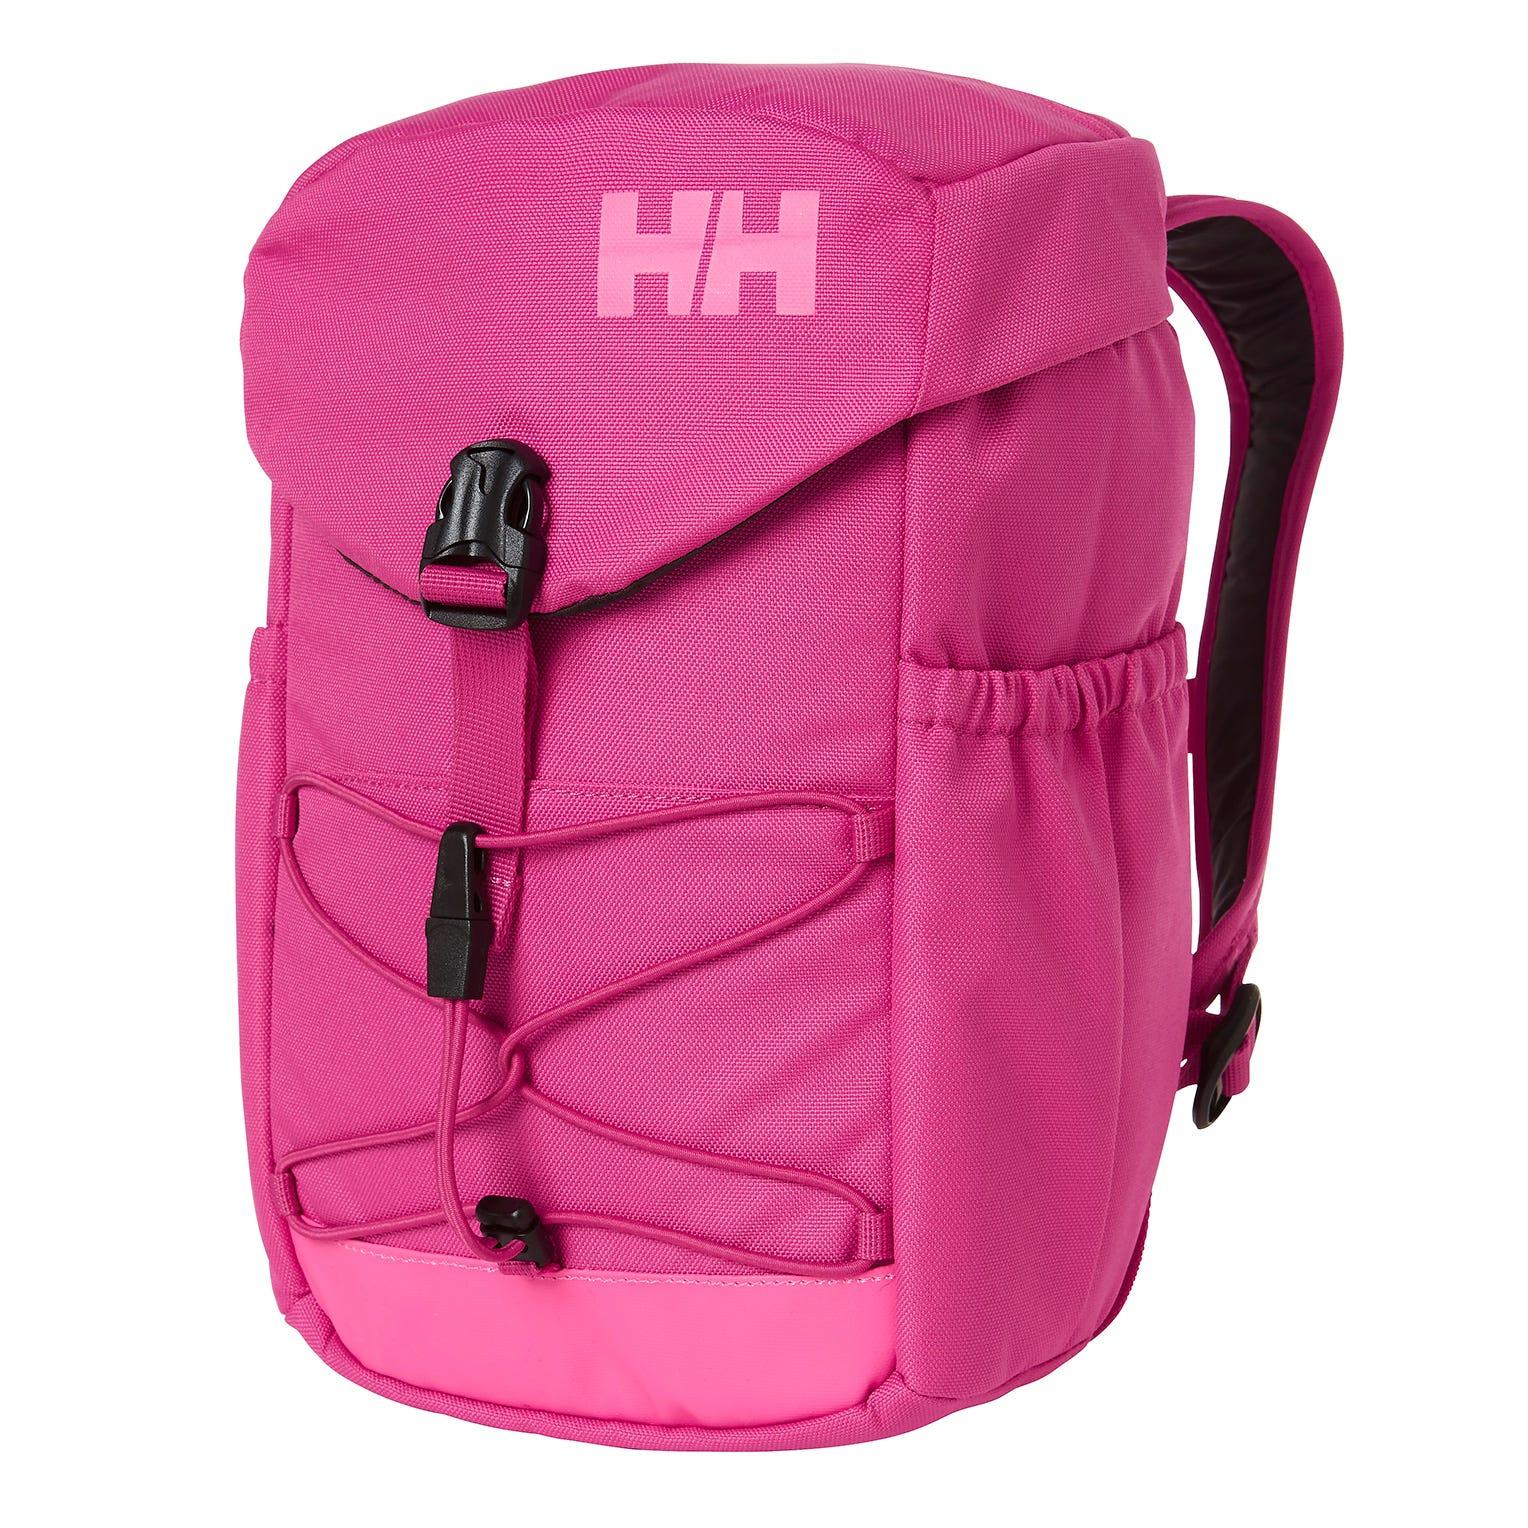 Helly Hansen Kids Outdoor Backpack Baselayer Pink STD